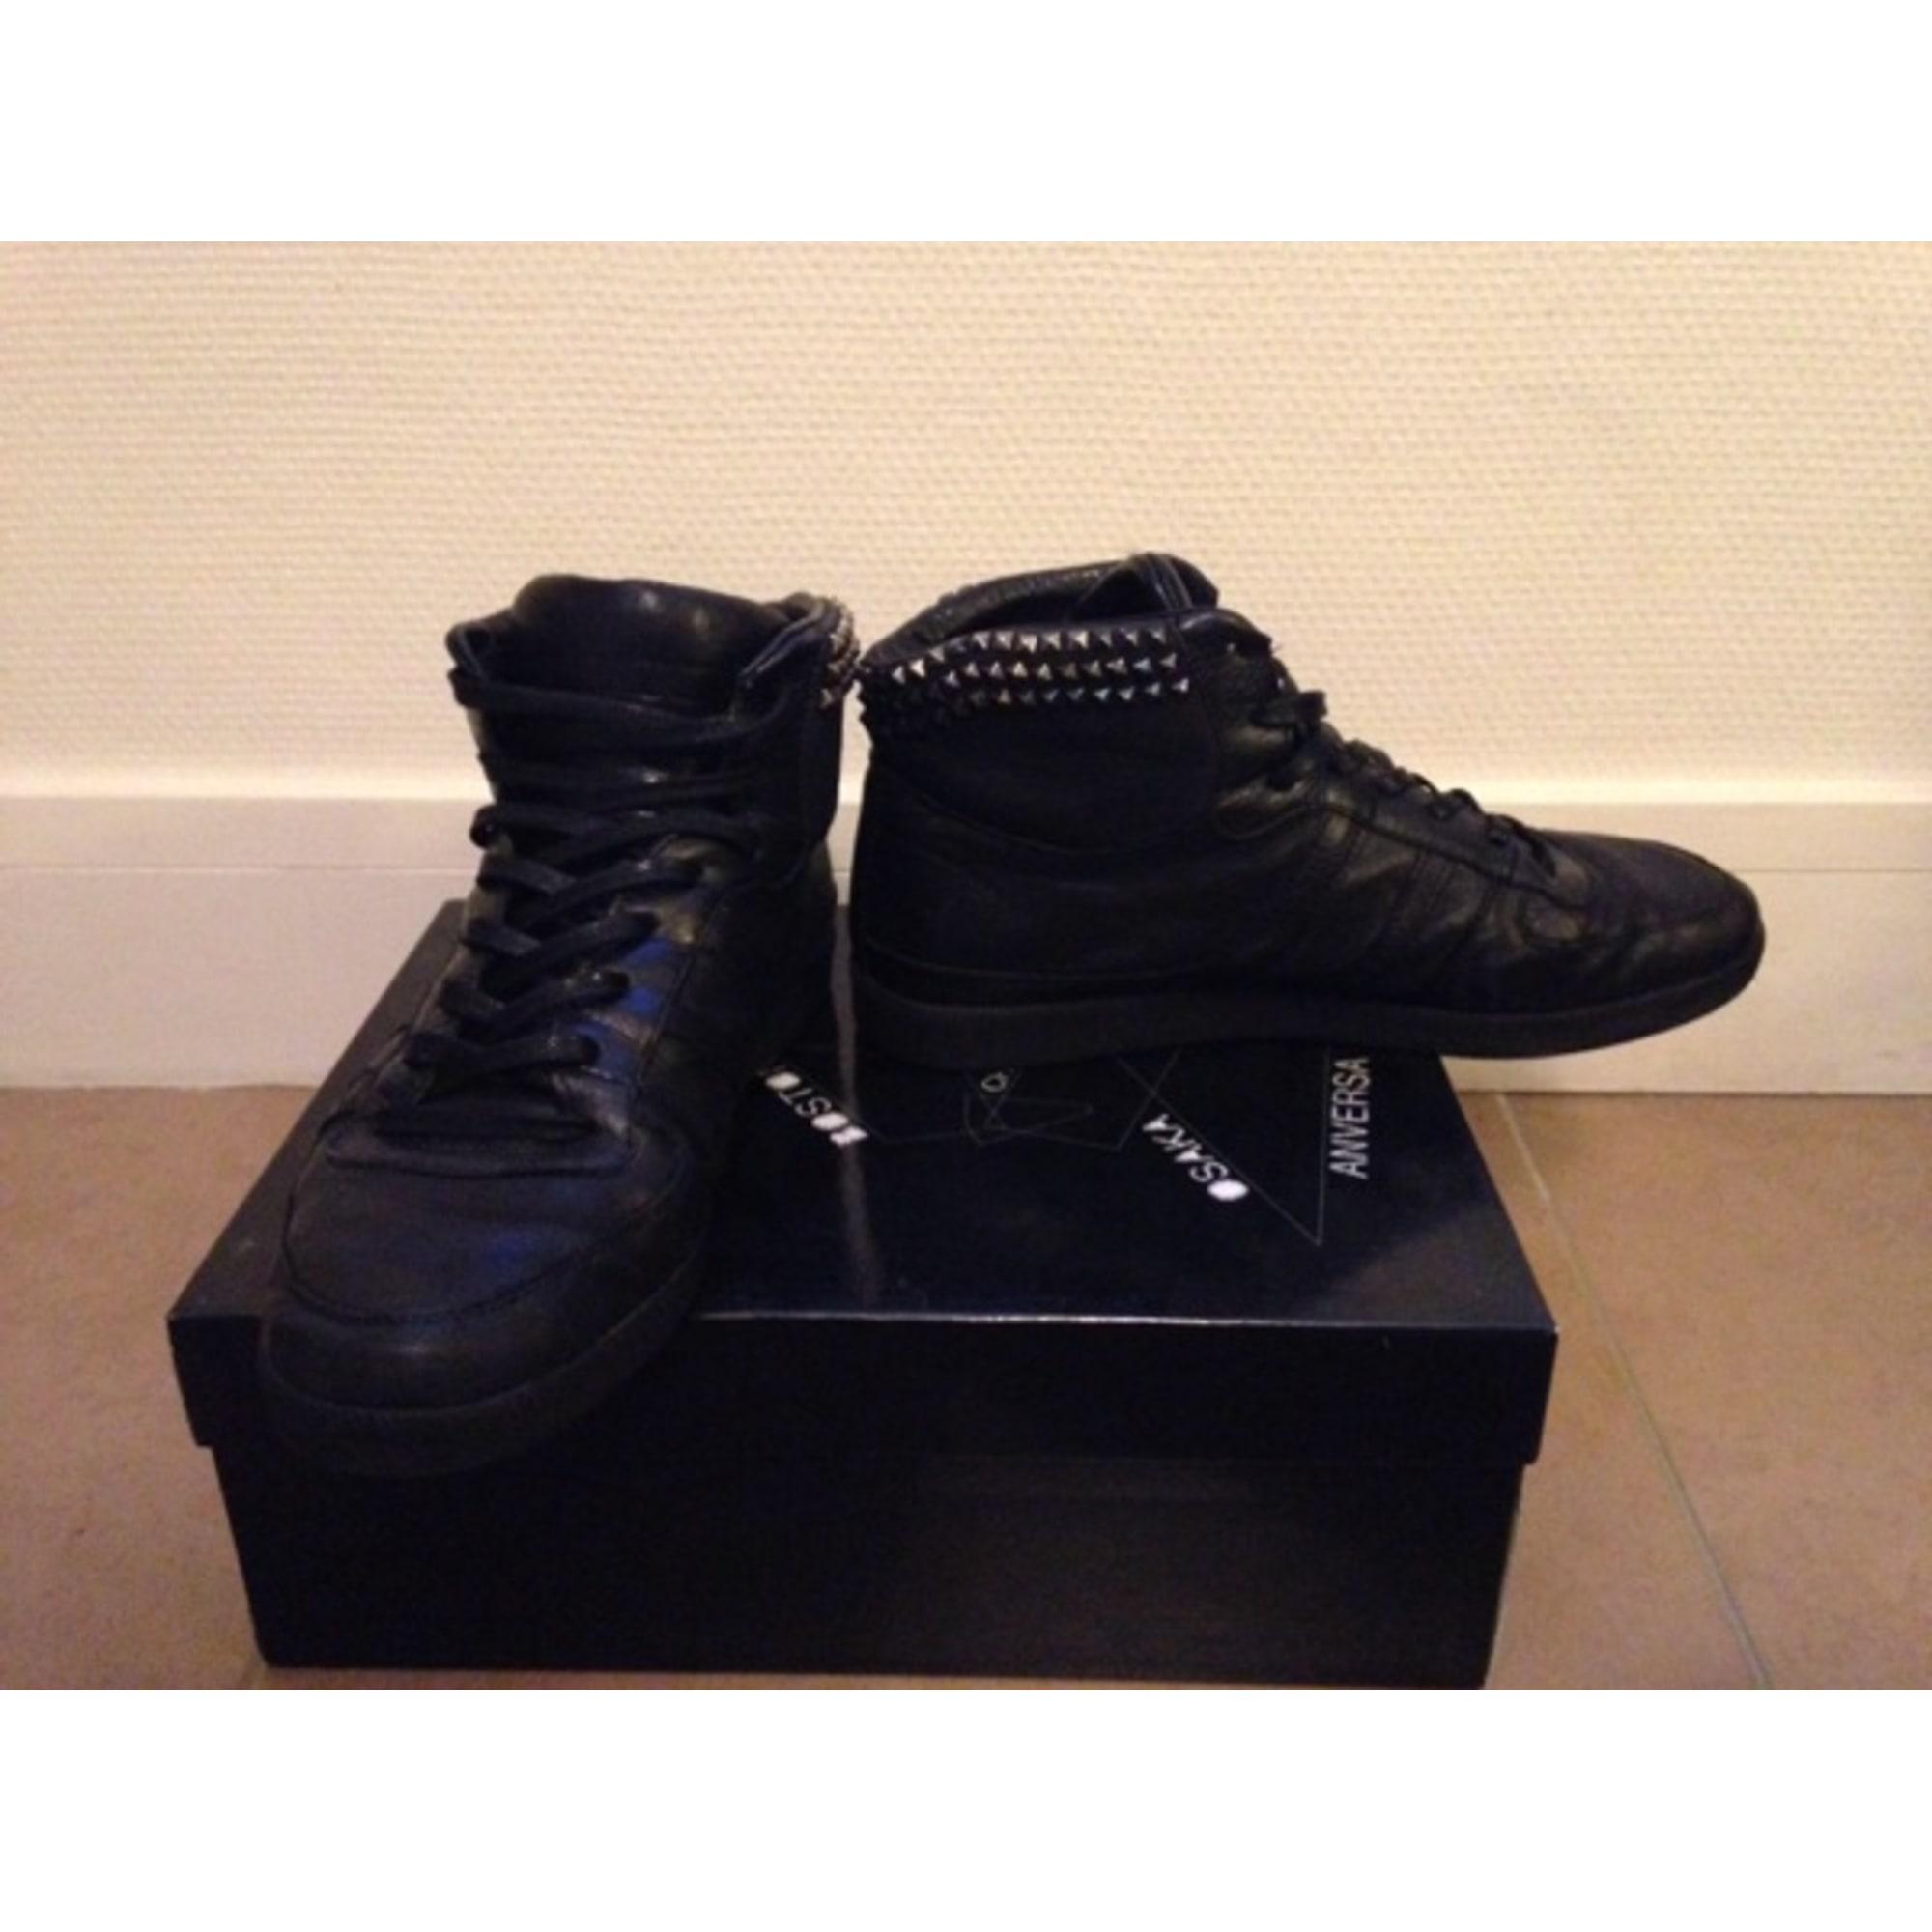 220a8bf4b6 Baskets SERAFINI 41 noir vendu par Blanchardanne - 2671595